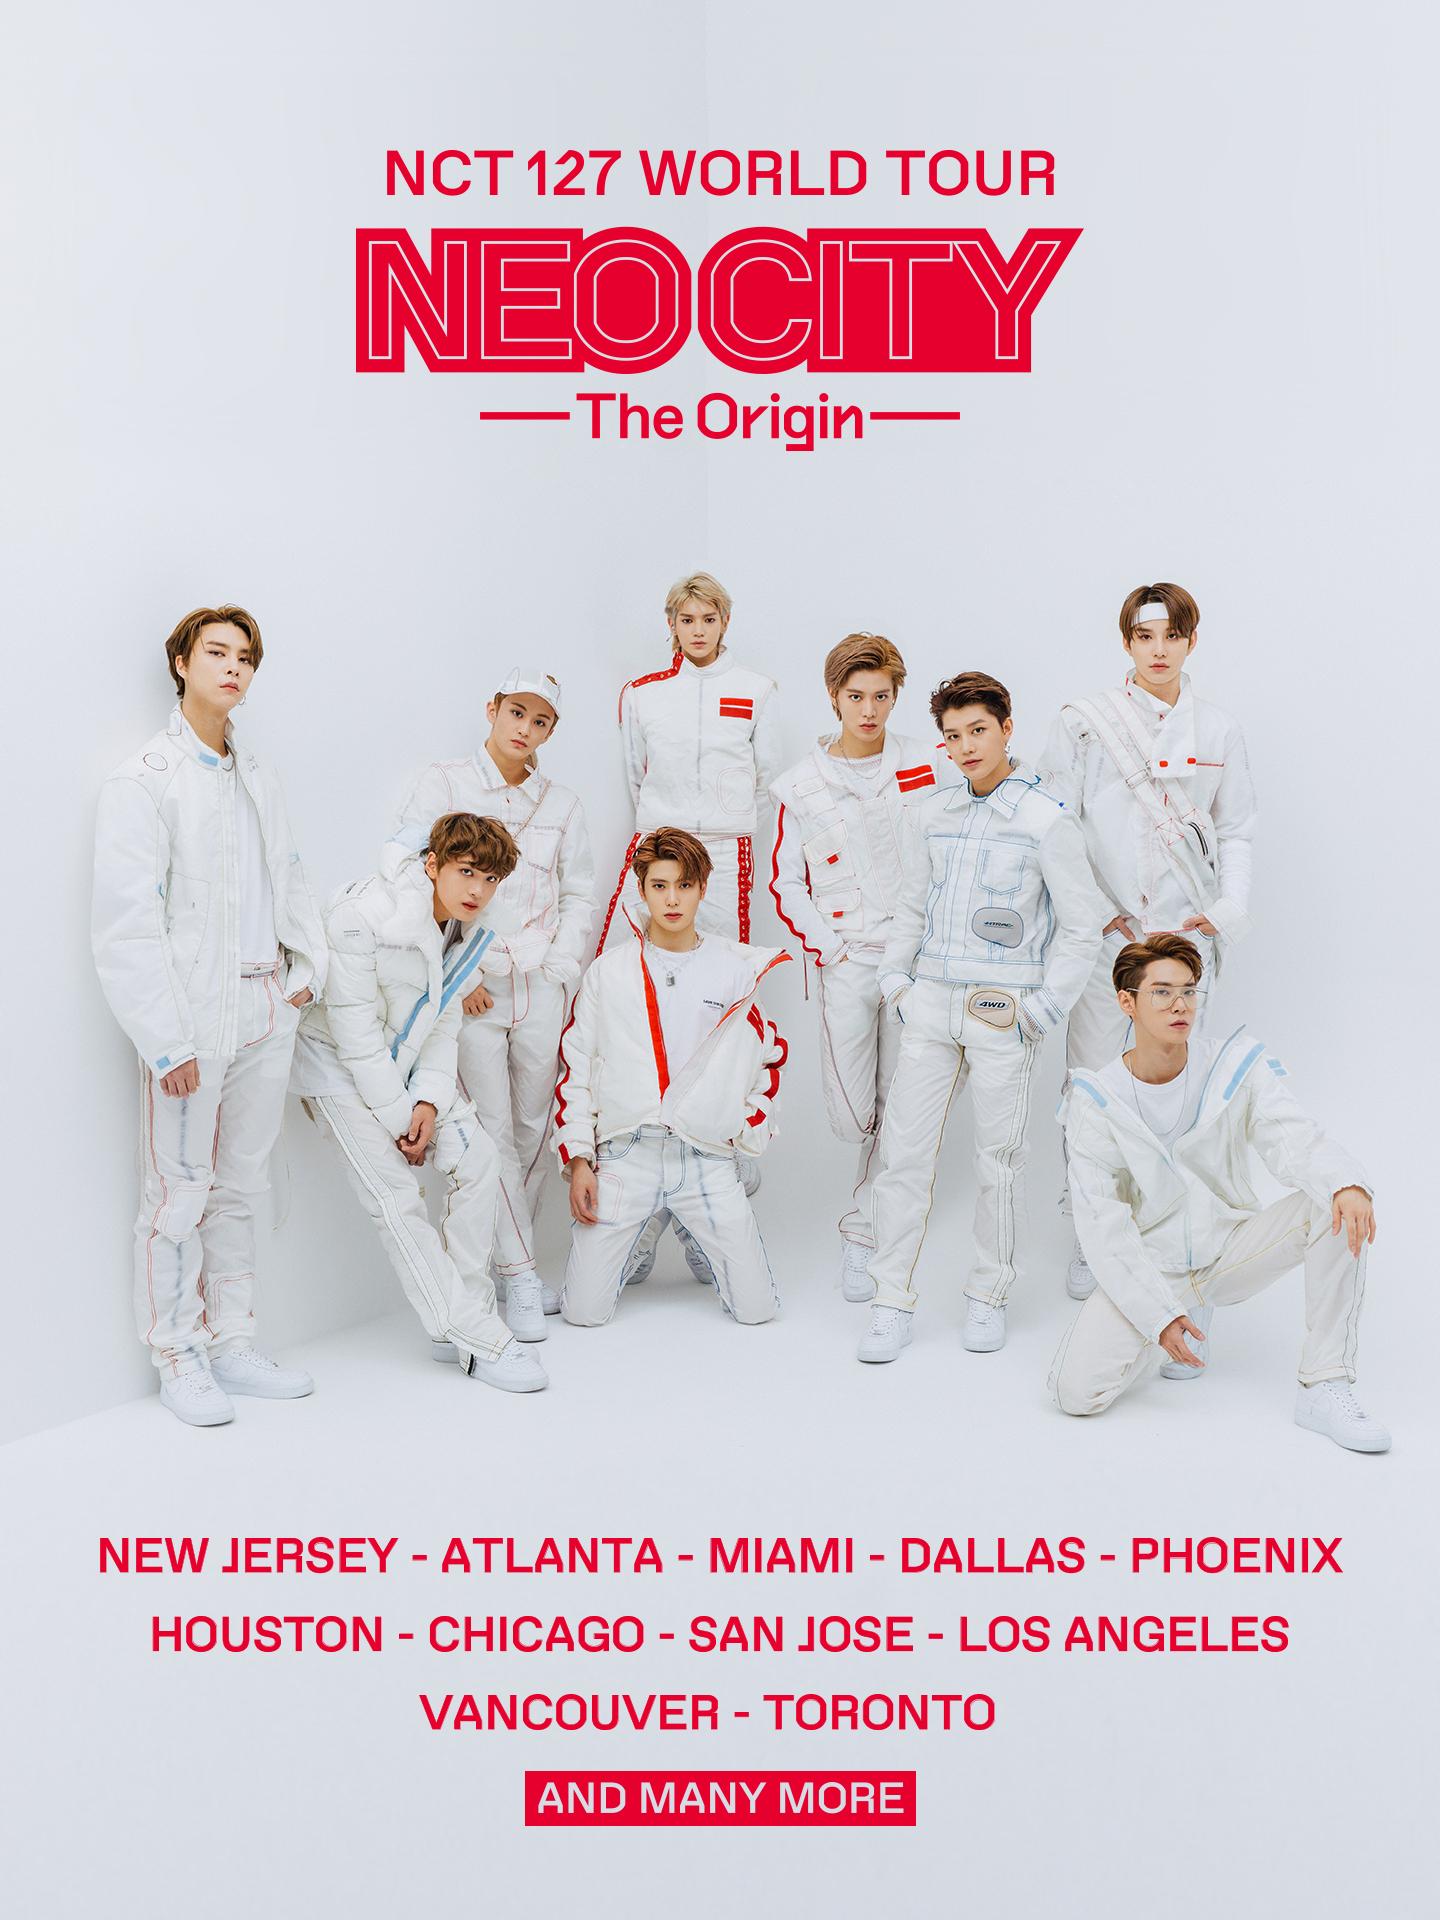 NCT 127世界巡演!亚洲、美洲、欧洲等世界范围公演确定